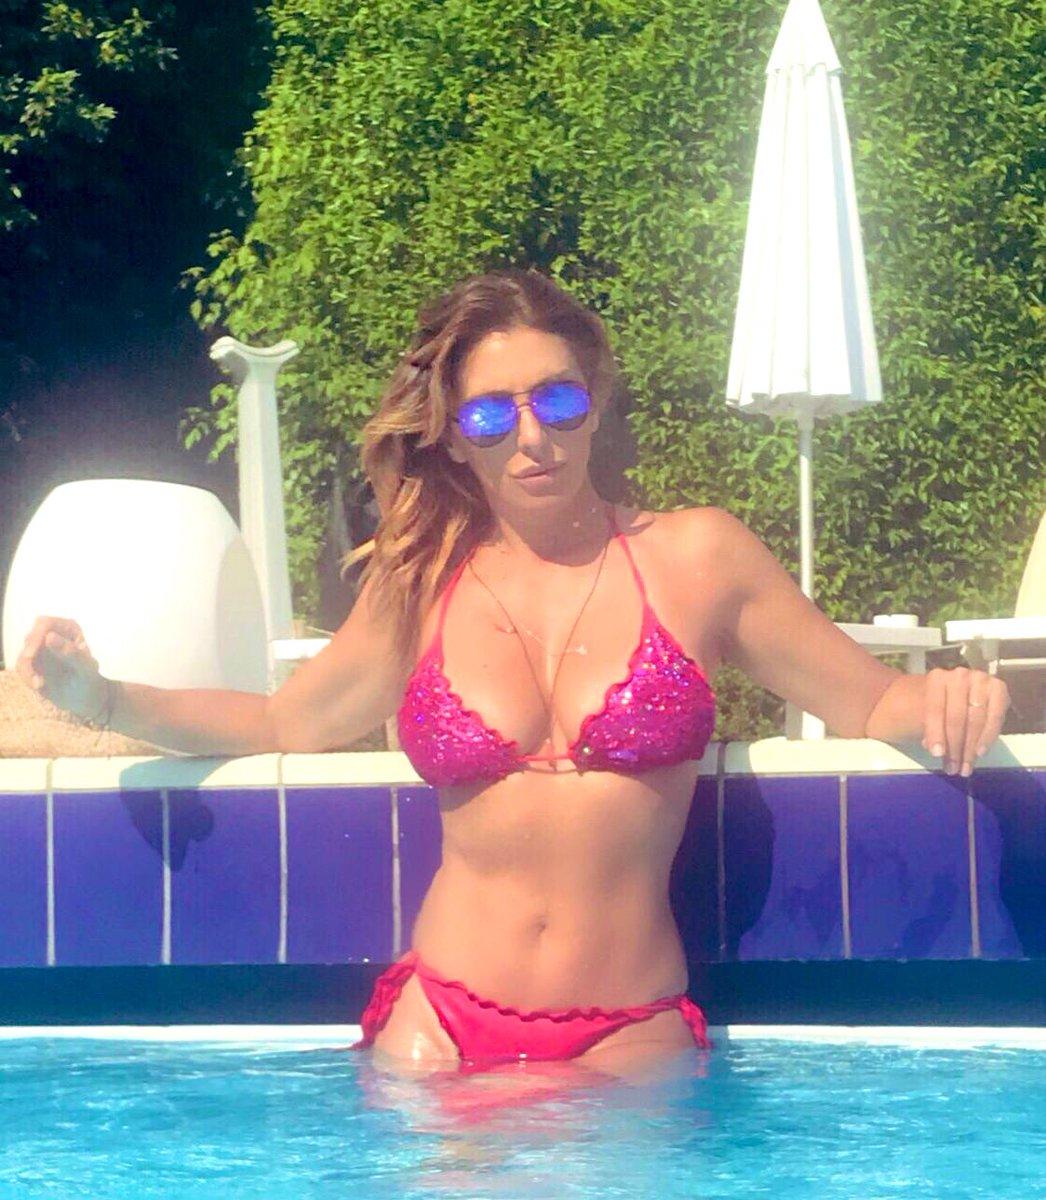 Caldo infernale, metodo veloce ???? #piscina #swimmingpool #summer #sabrina #sabrinasalerno https://t.co/nPApRcYNcv